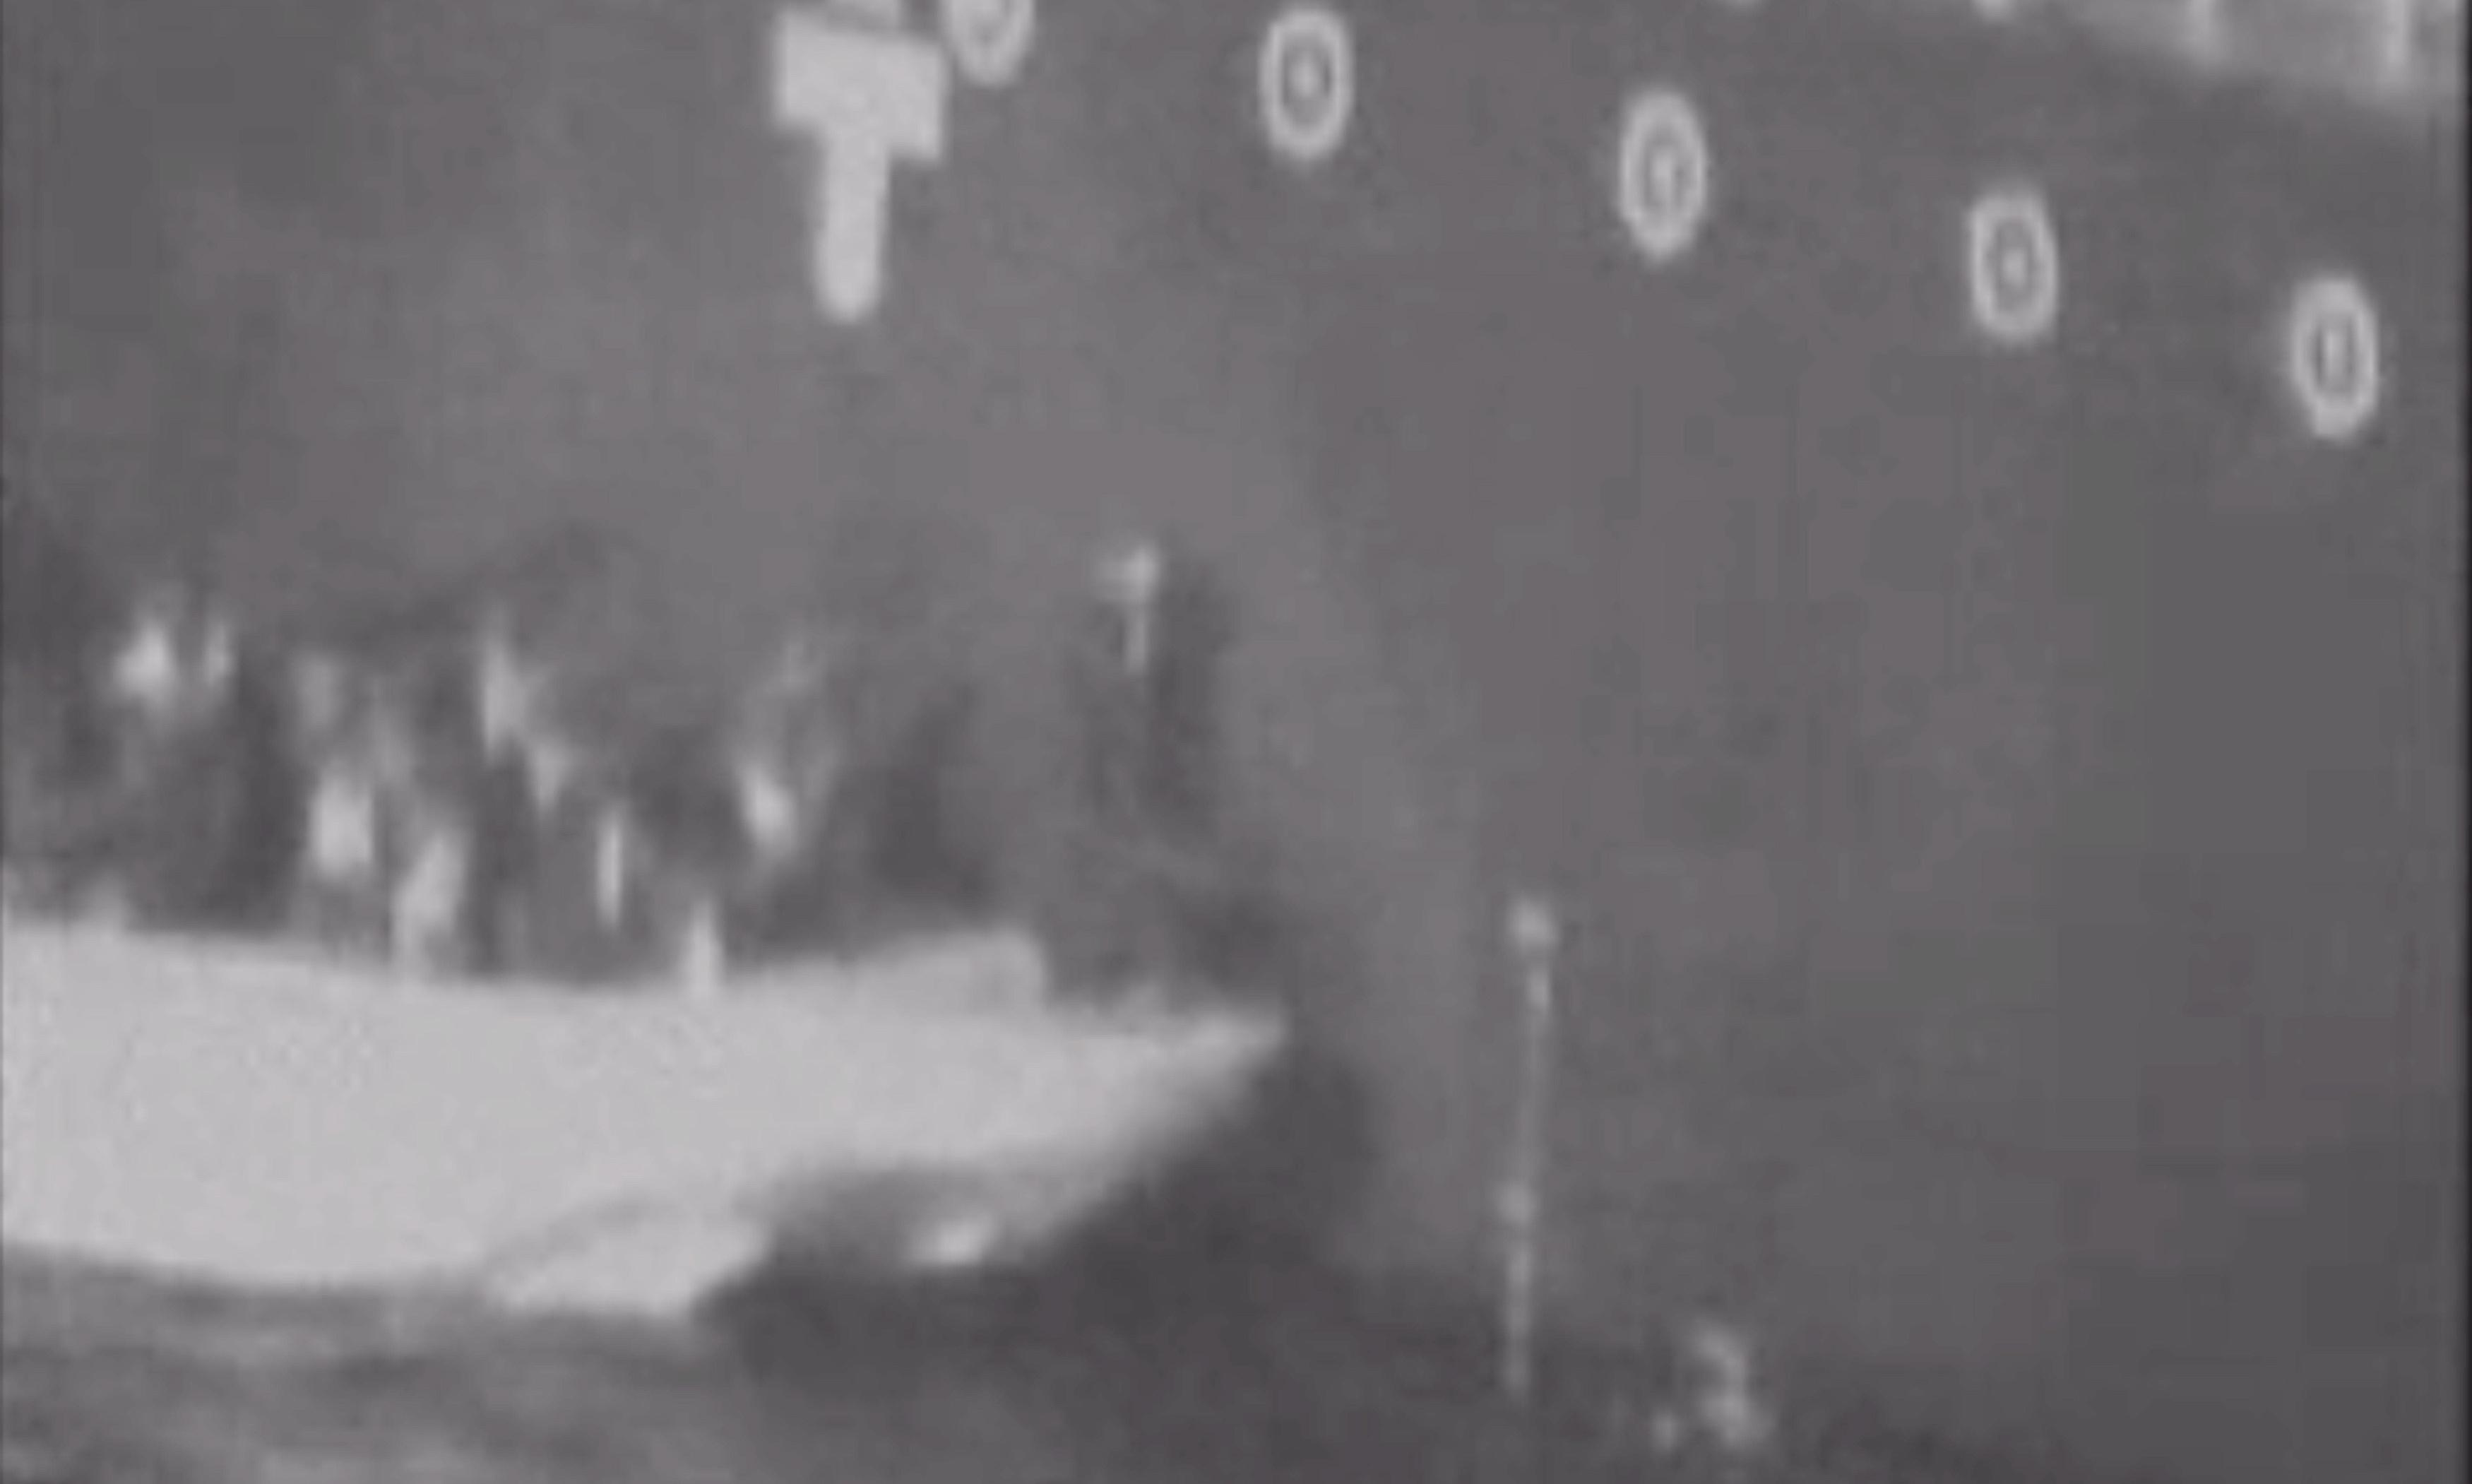 UK joins US in accusing Iran of tanker attacks as crew held